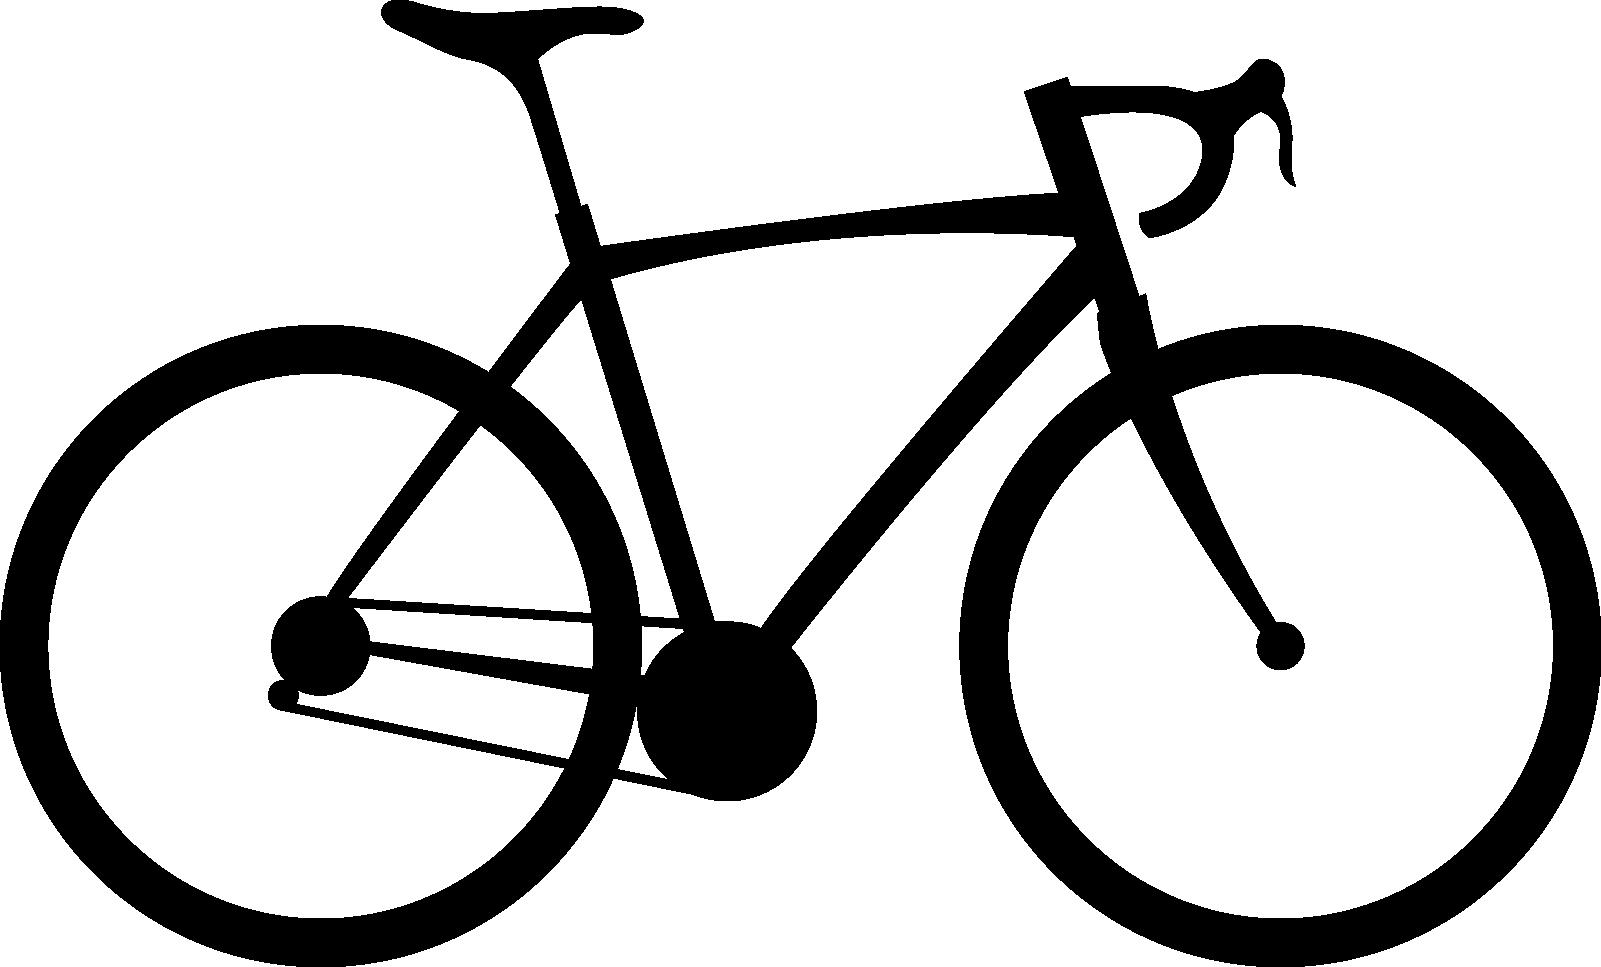 banner transparent stock cUNRMPQ